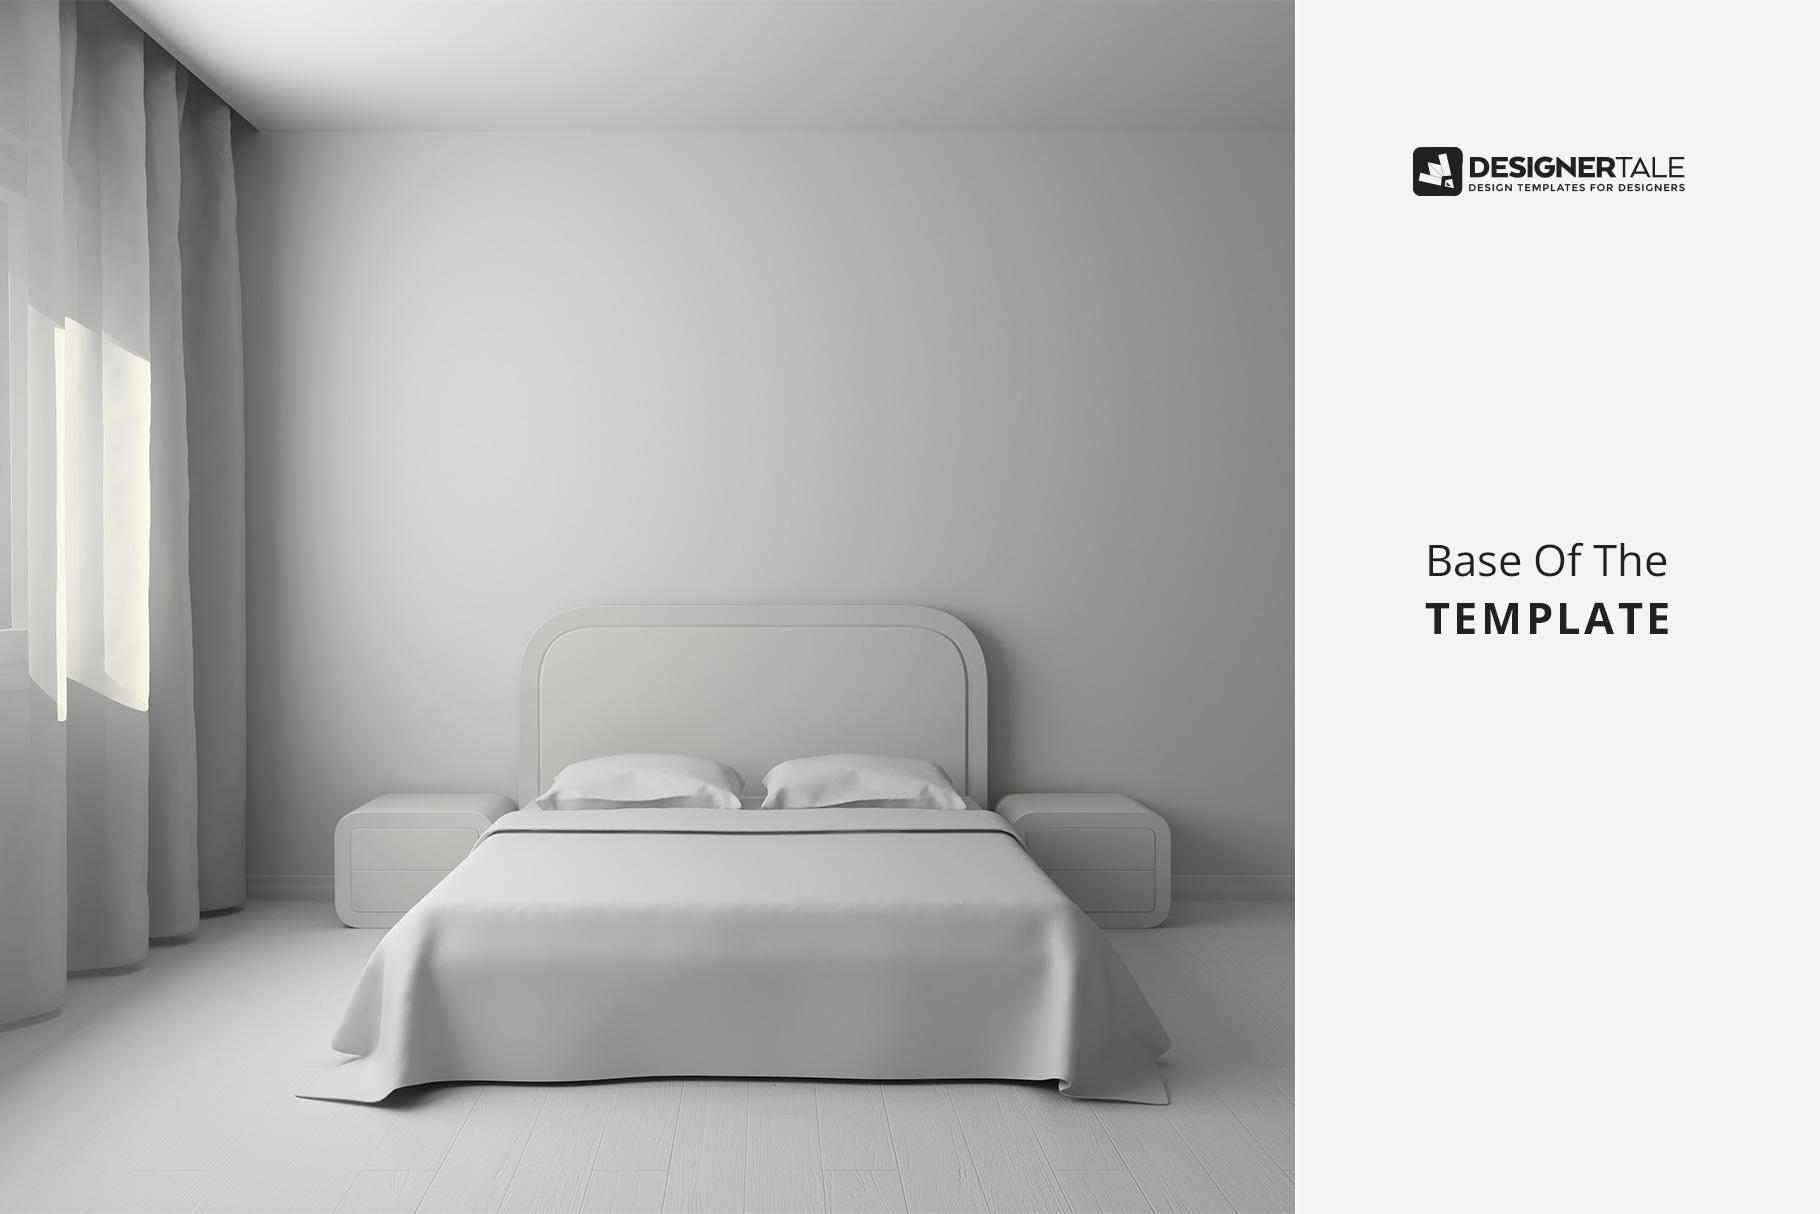 base image of the bedroom interior mockup